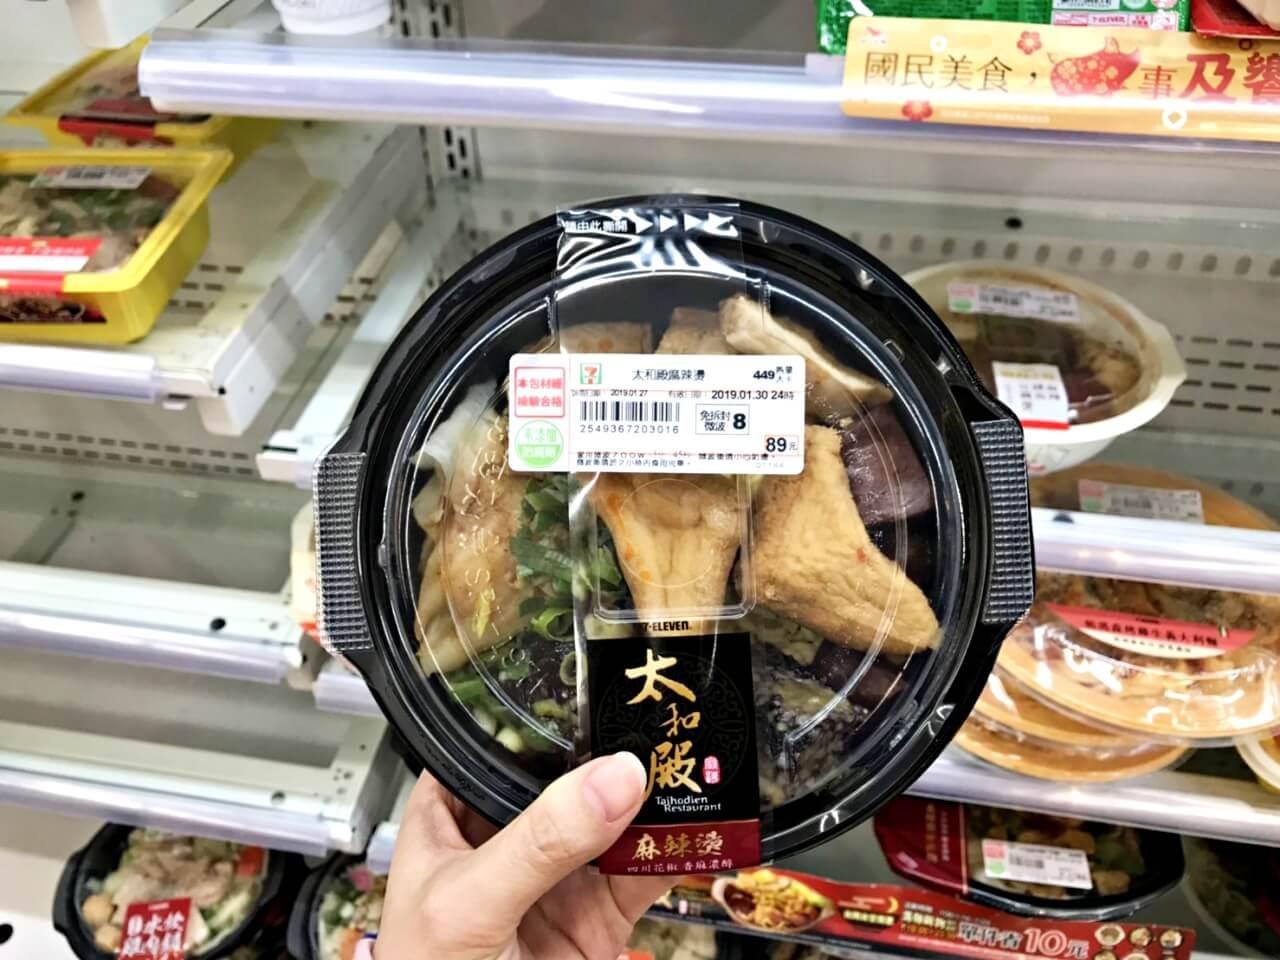 7-11微波食物